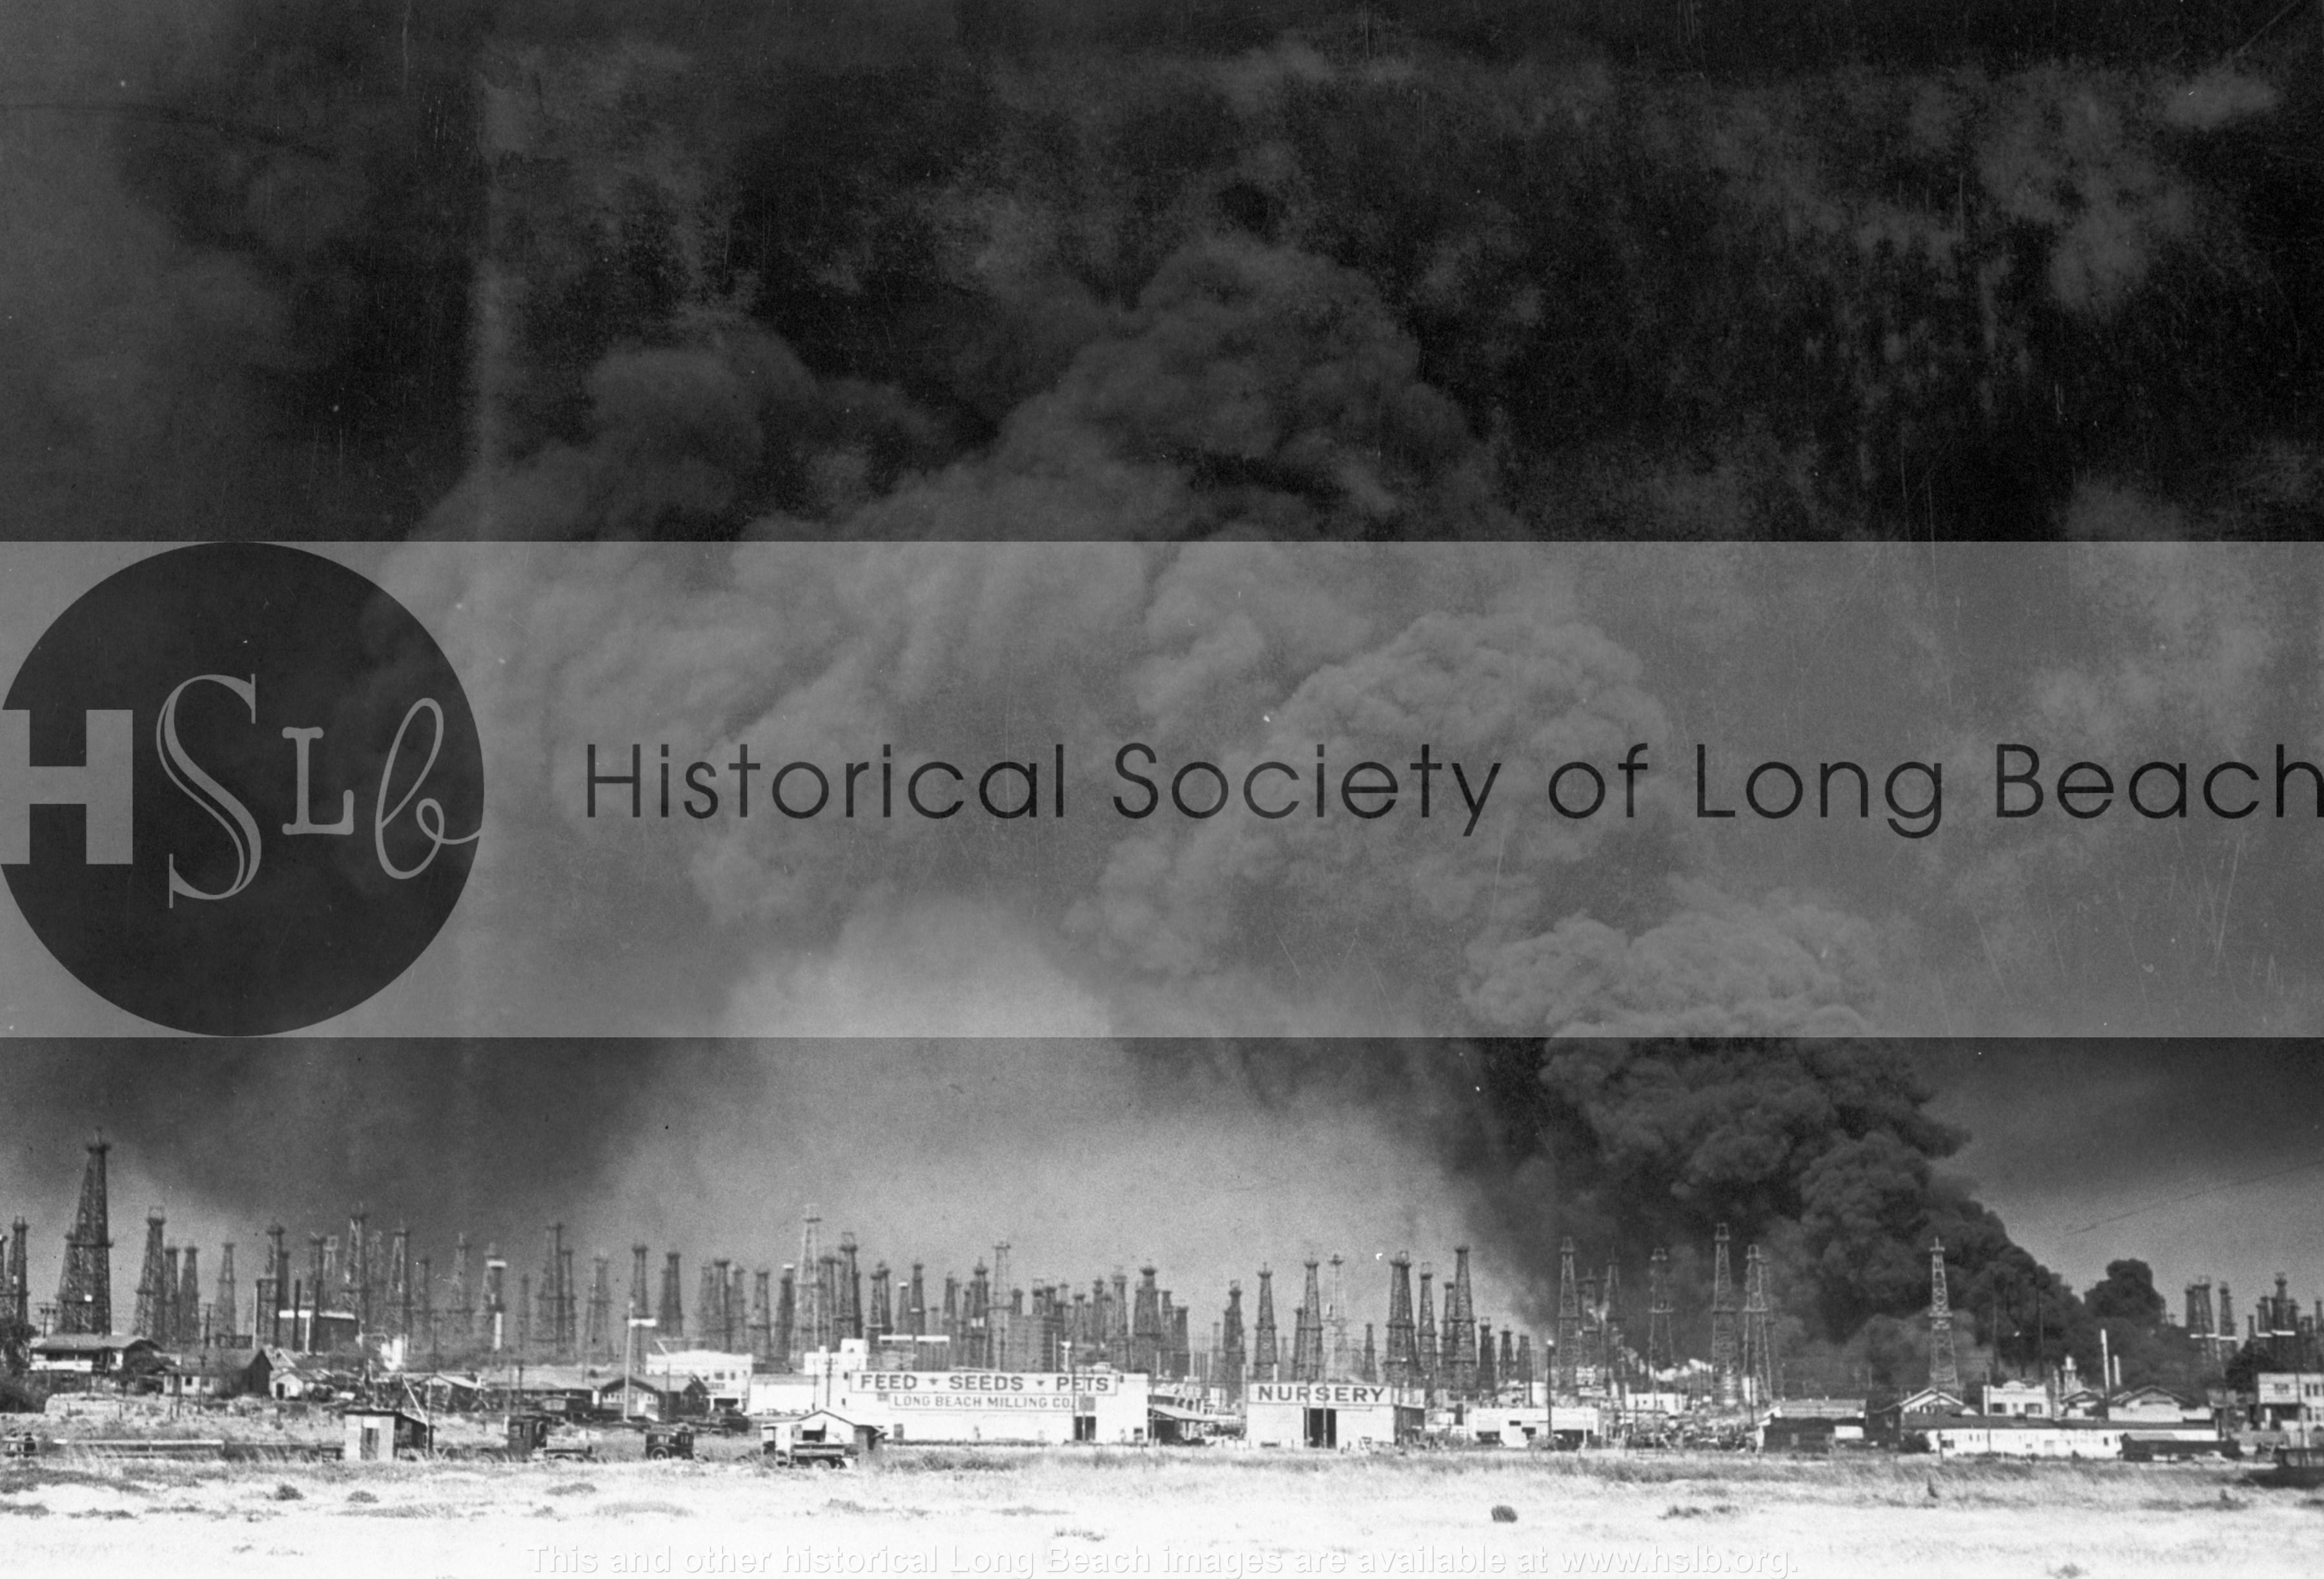 Richfield refinery explosion, 1933